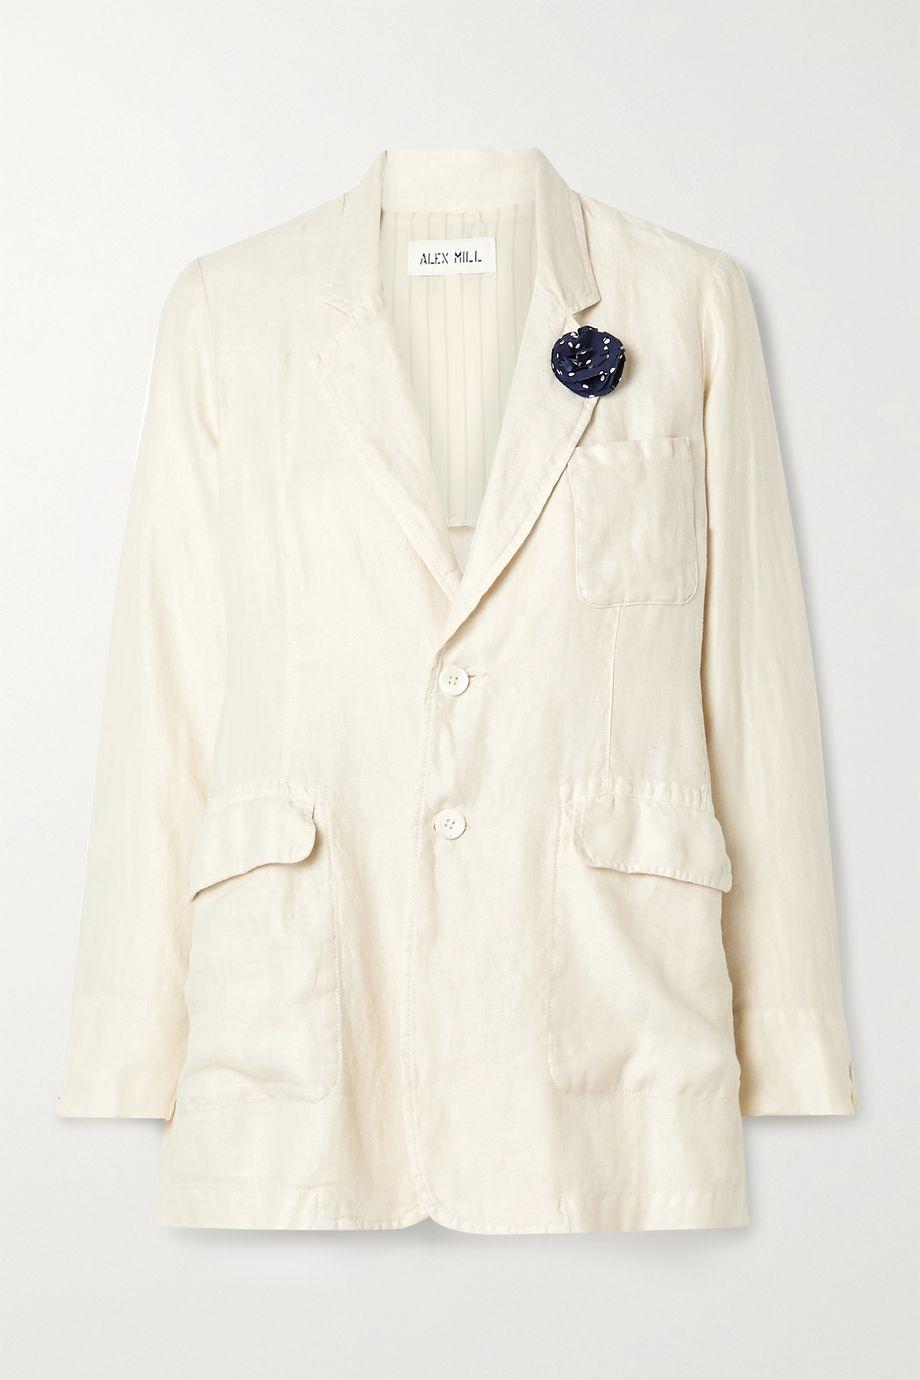 Alex Mill Boy linen blazer